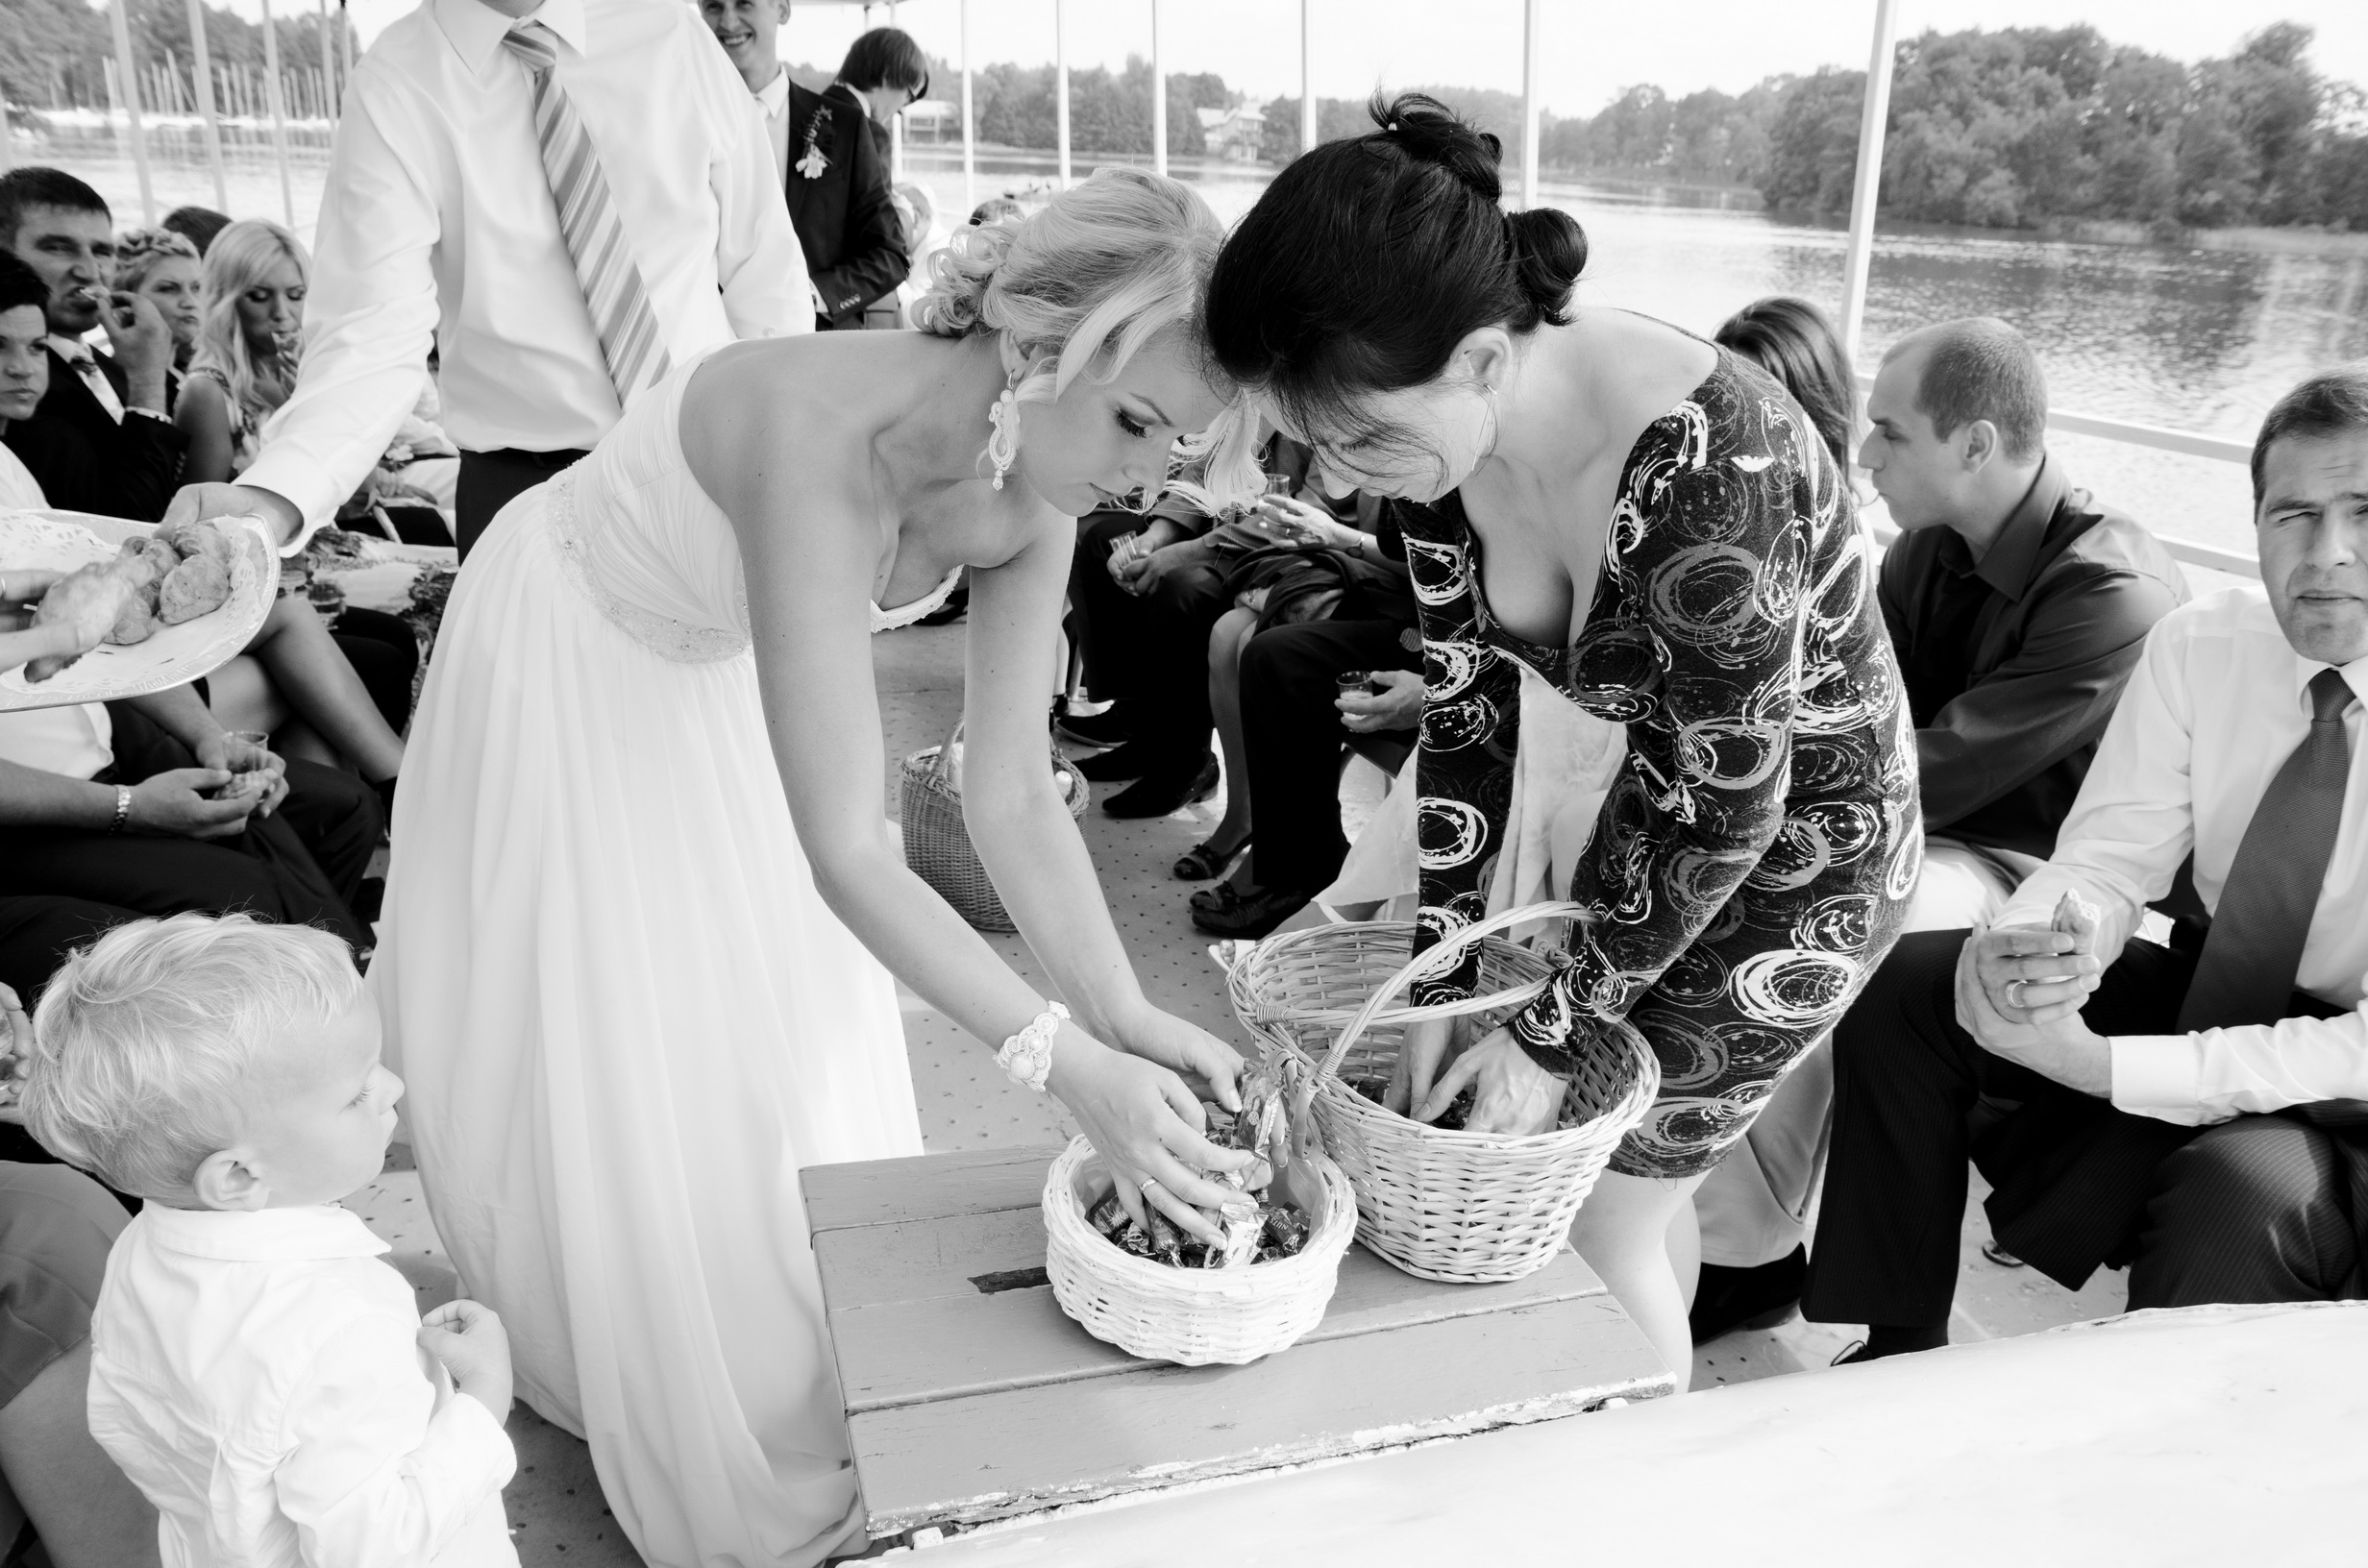 Islydejimas is namu per vestuves